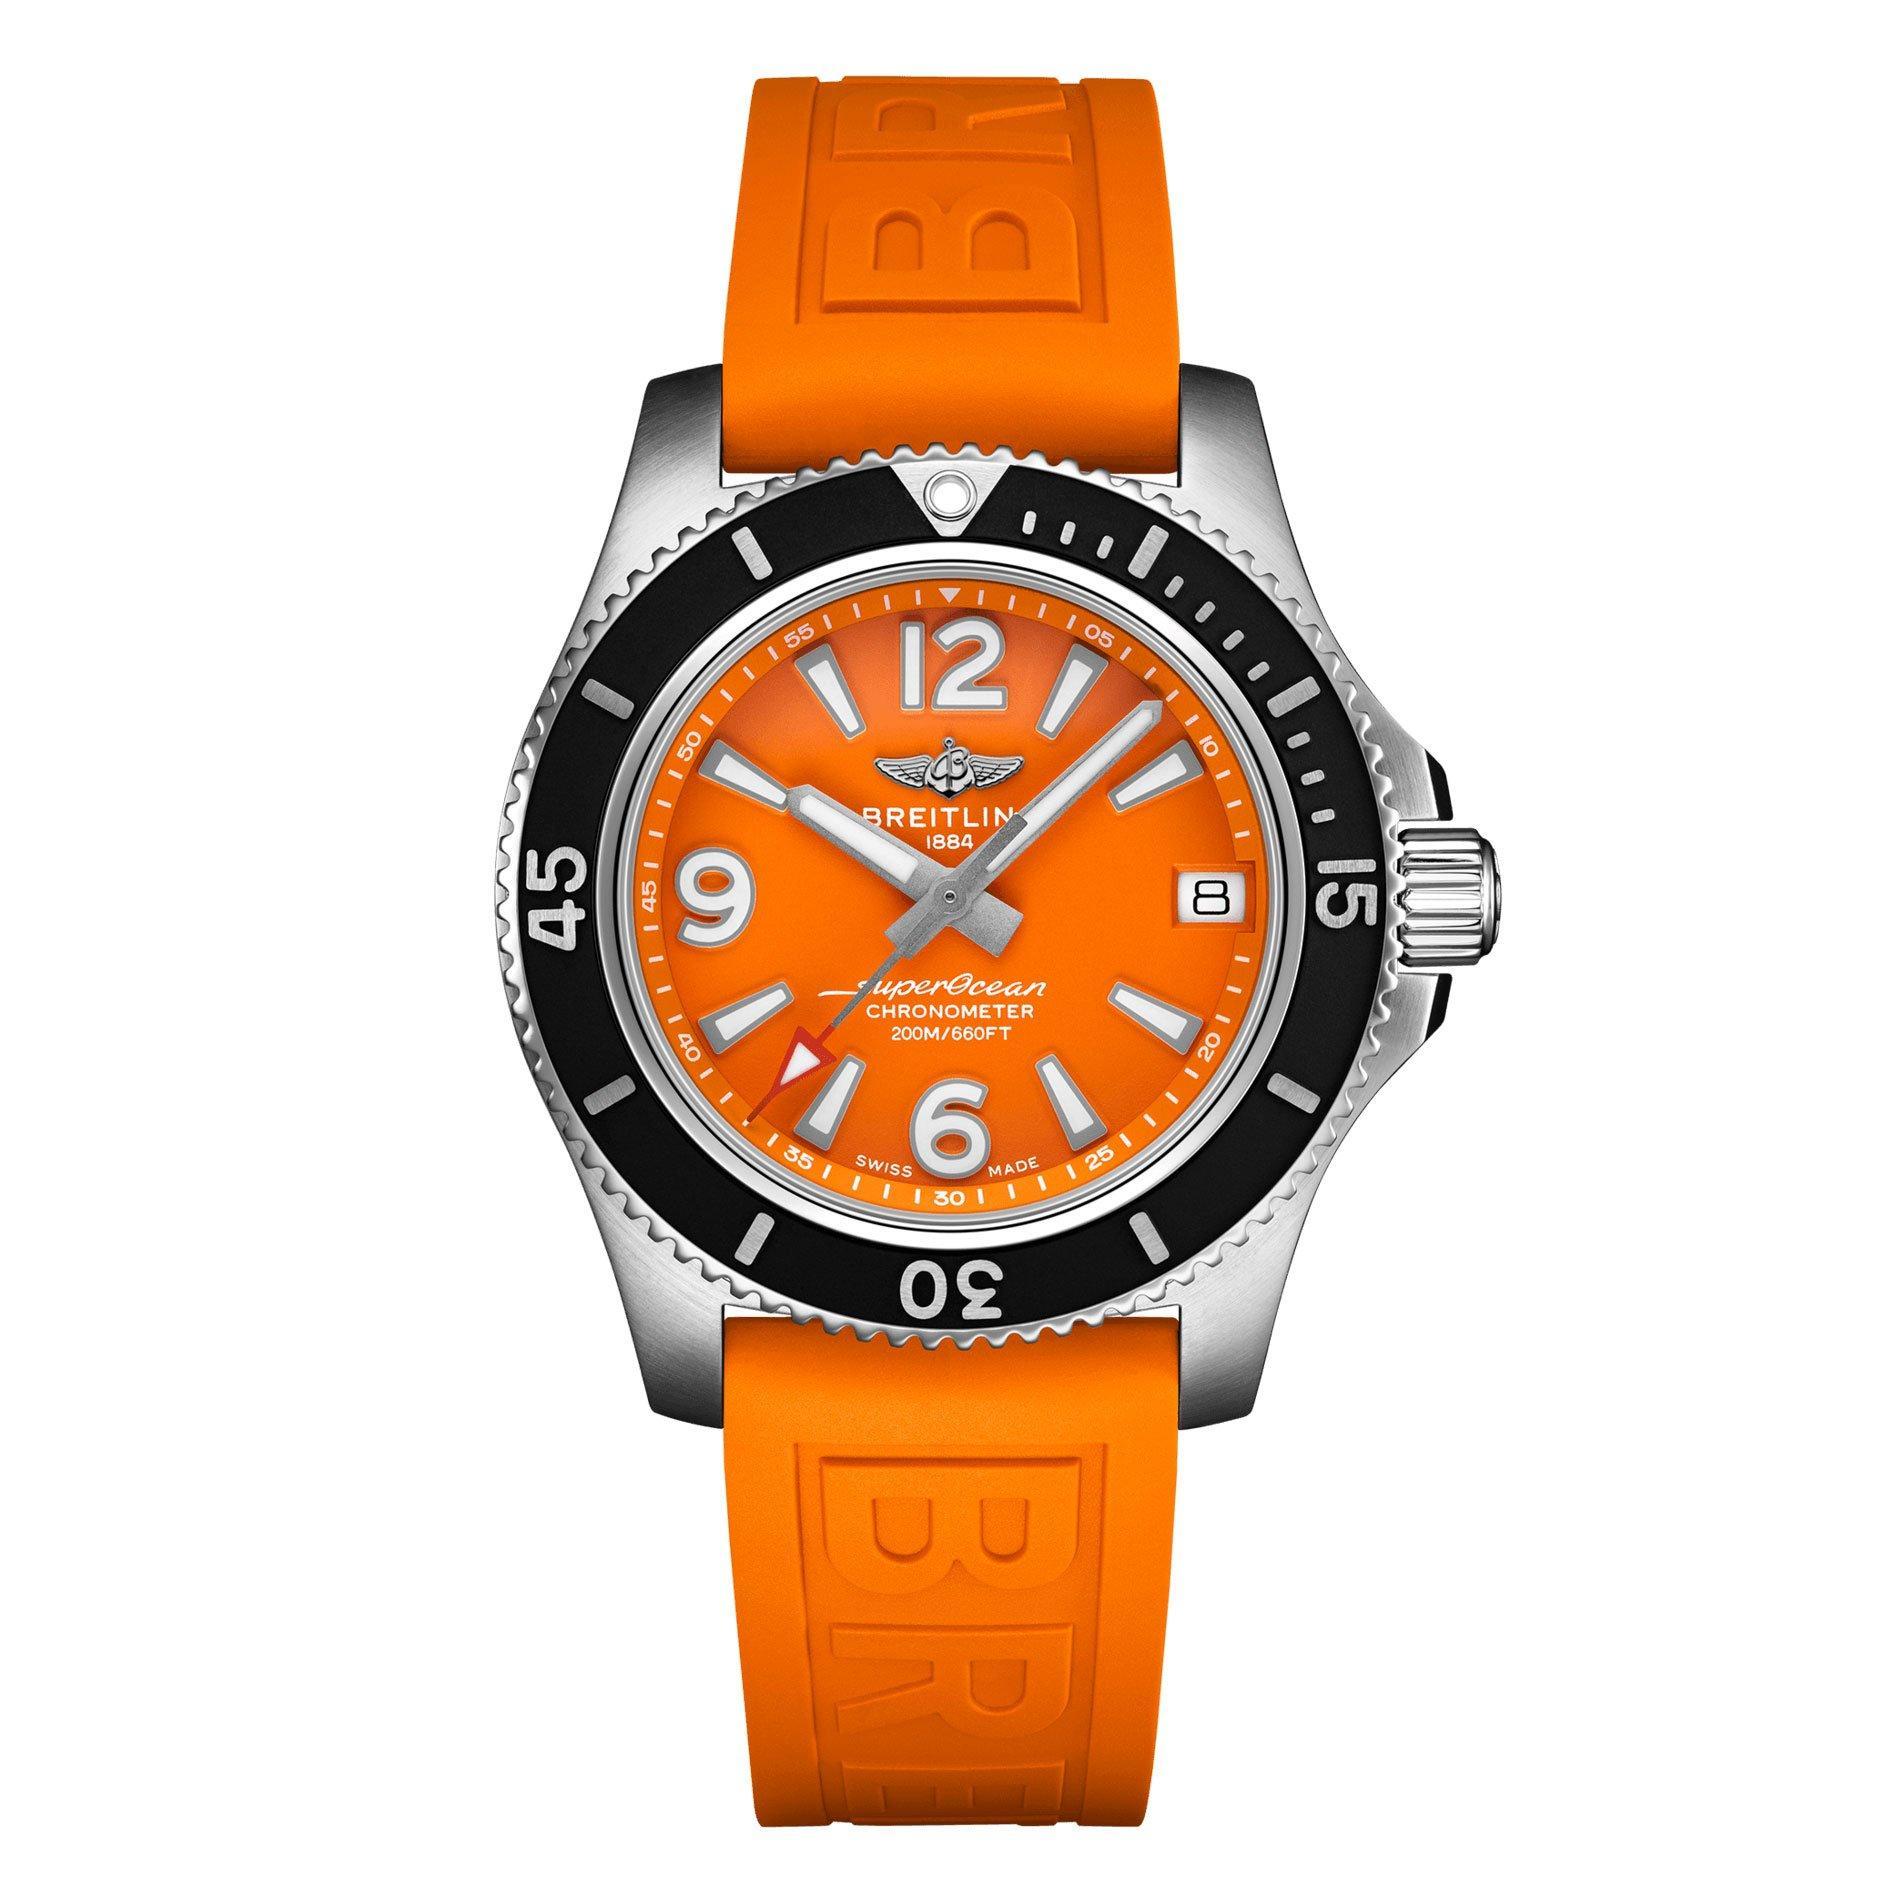 Breitling Superocean Automatic 36 Orange Ladies Watch